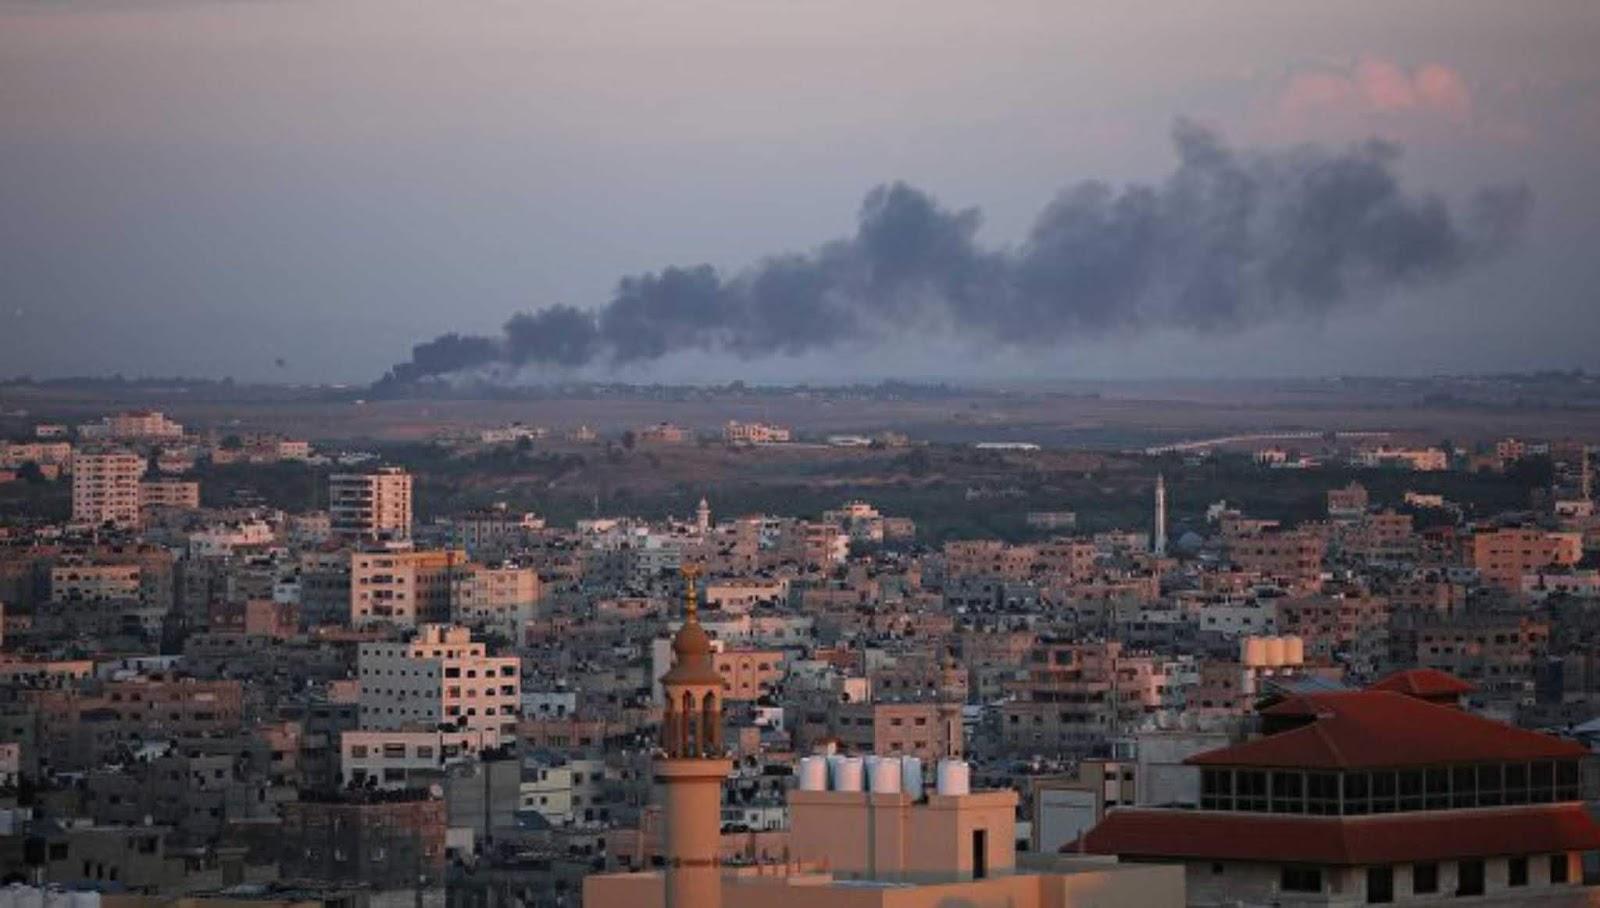 Sebuah helikopter tempur menyerang sebuah pos Hamas di Gaza